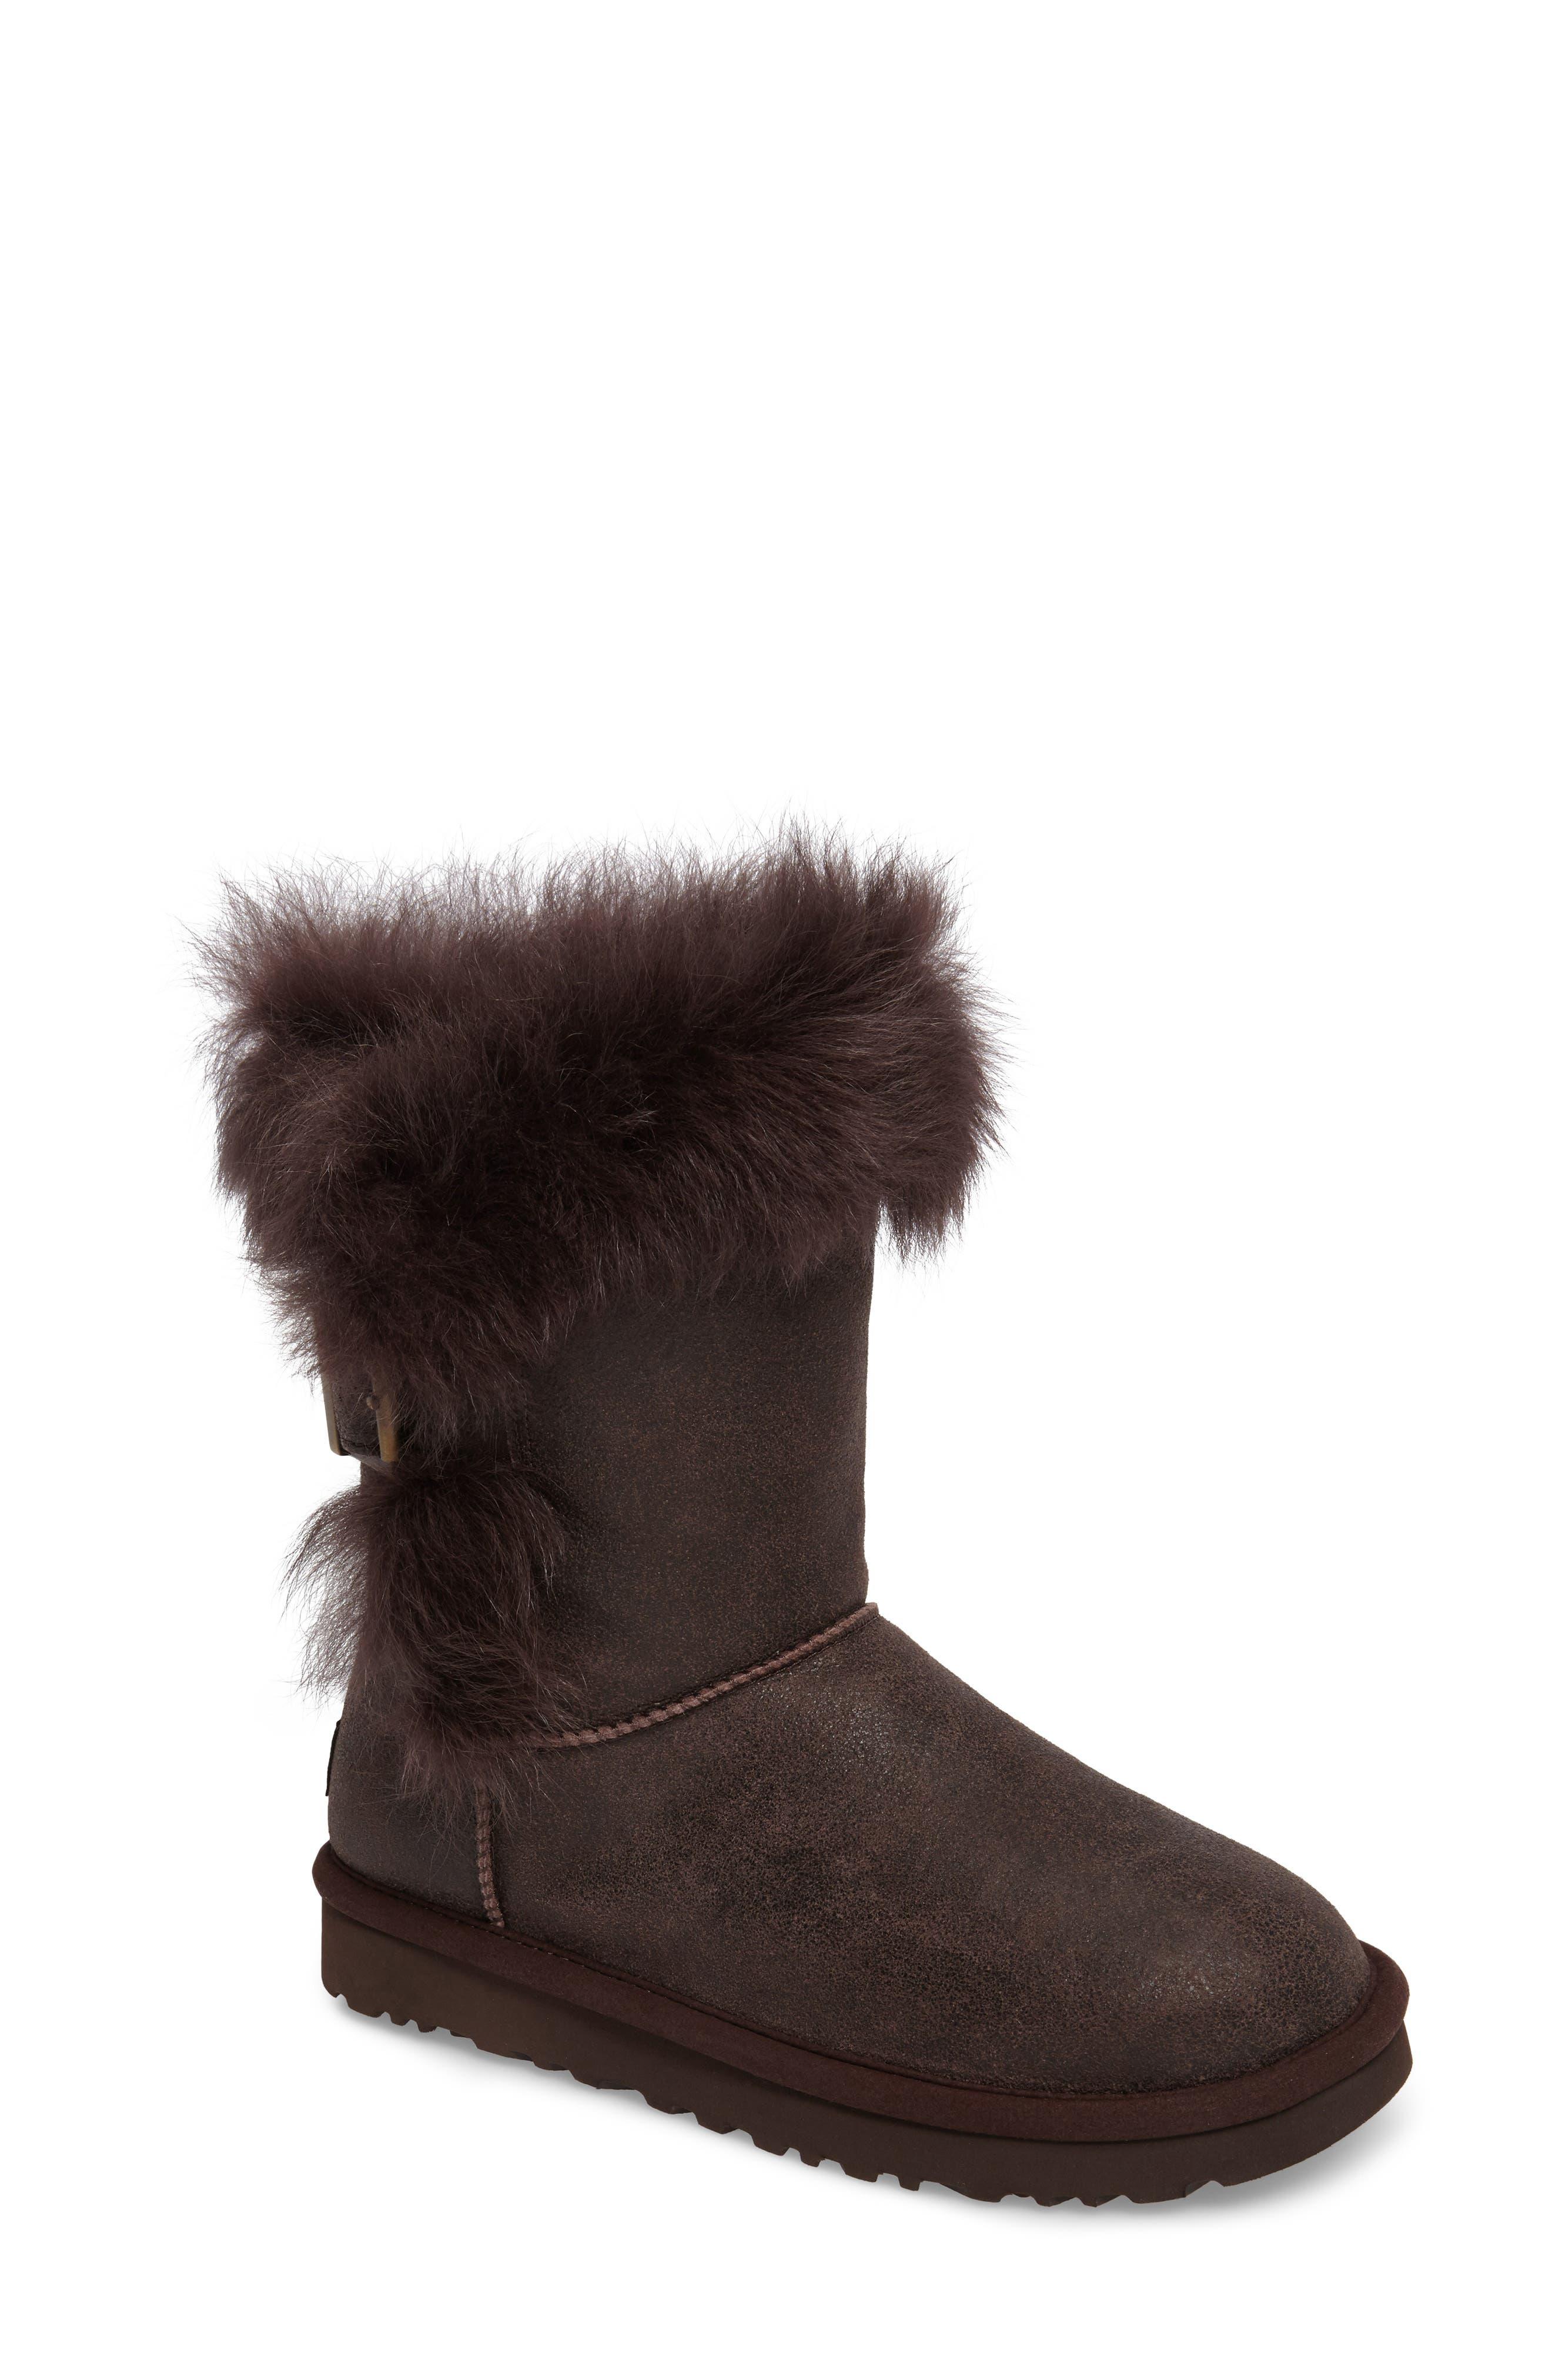 Alternate Image 1 Selected - UGG® Deena Boot (Women)